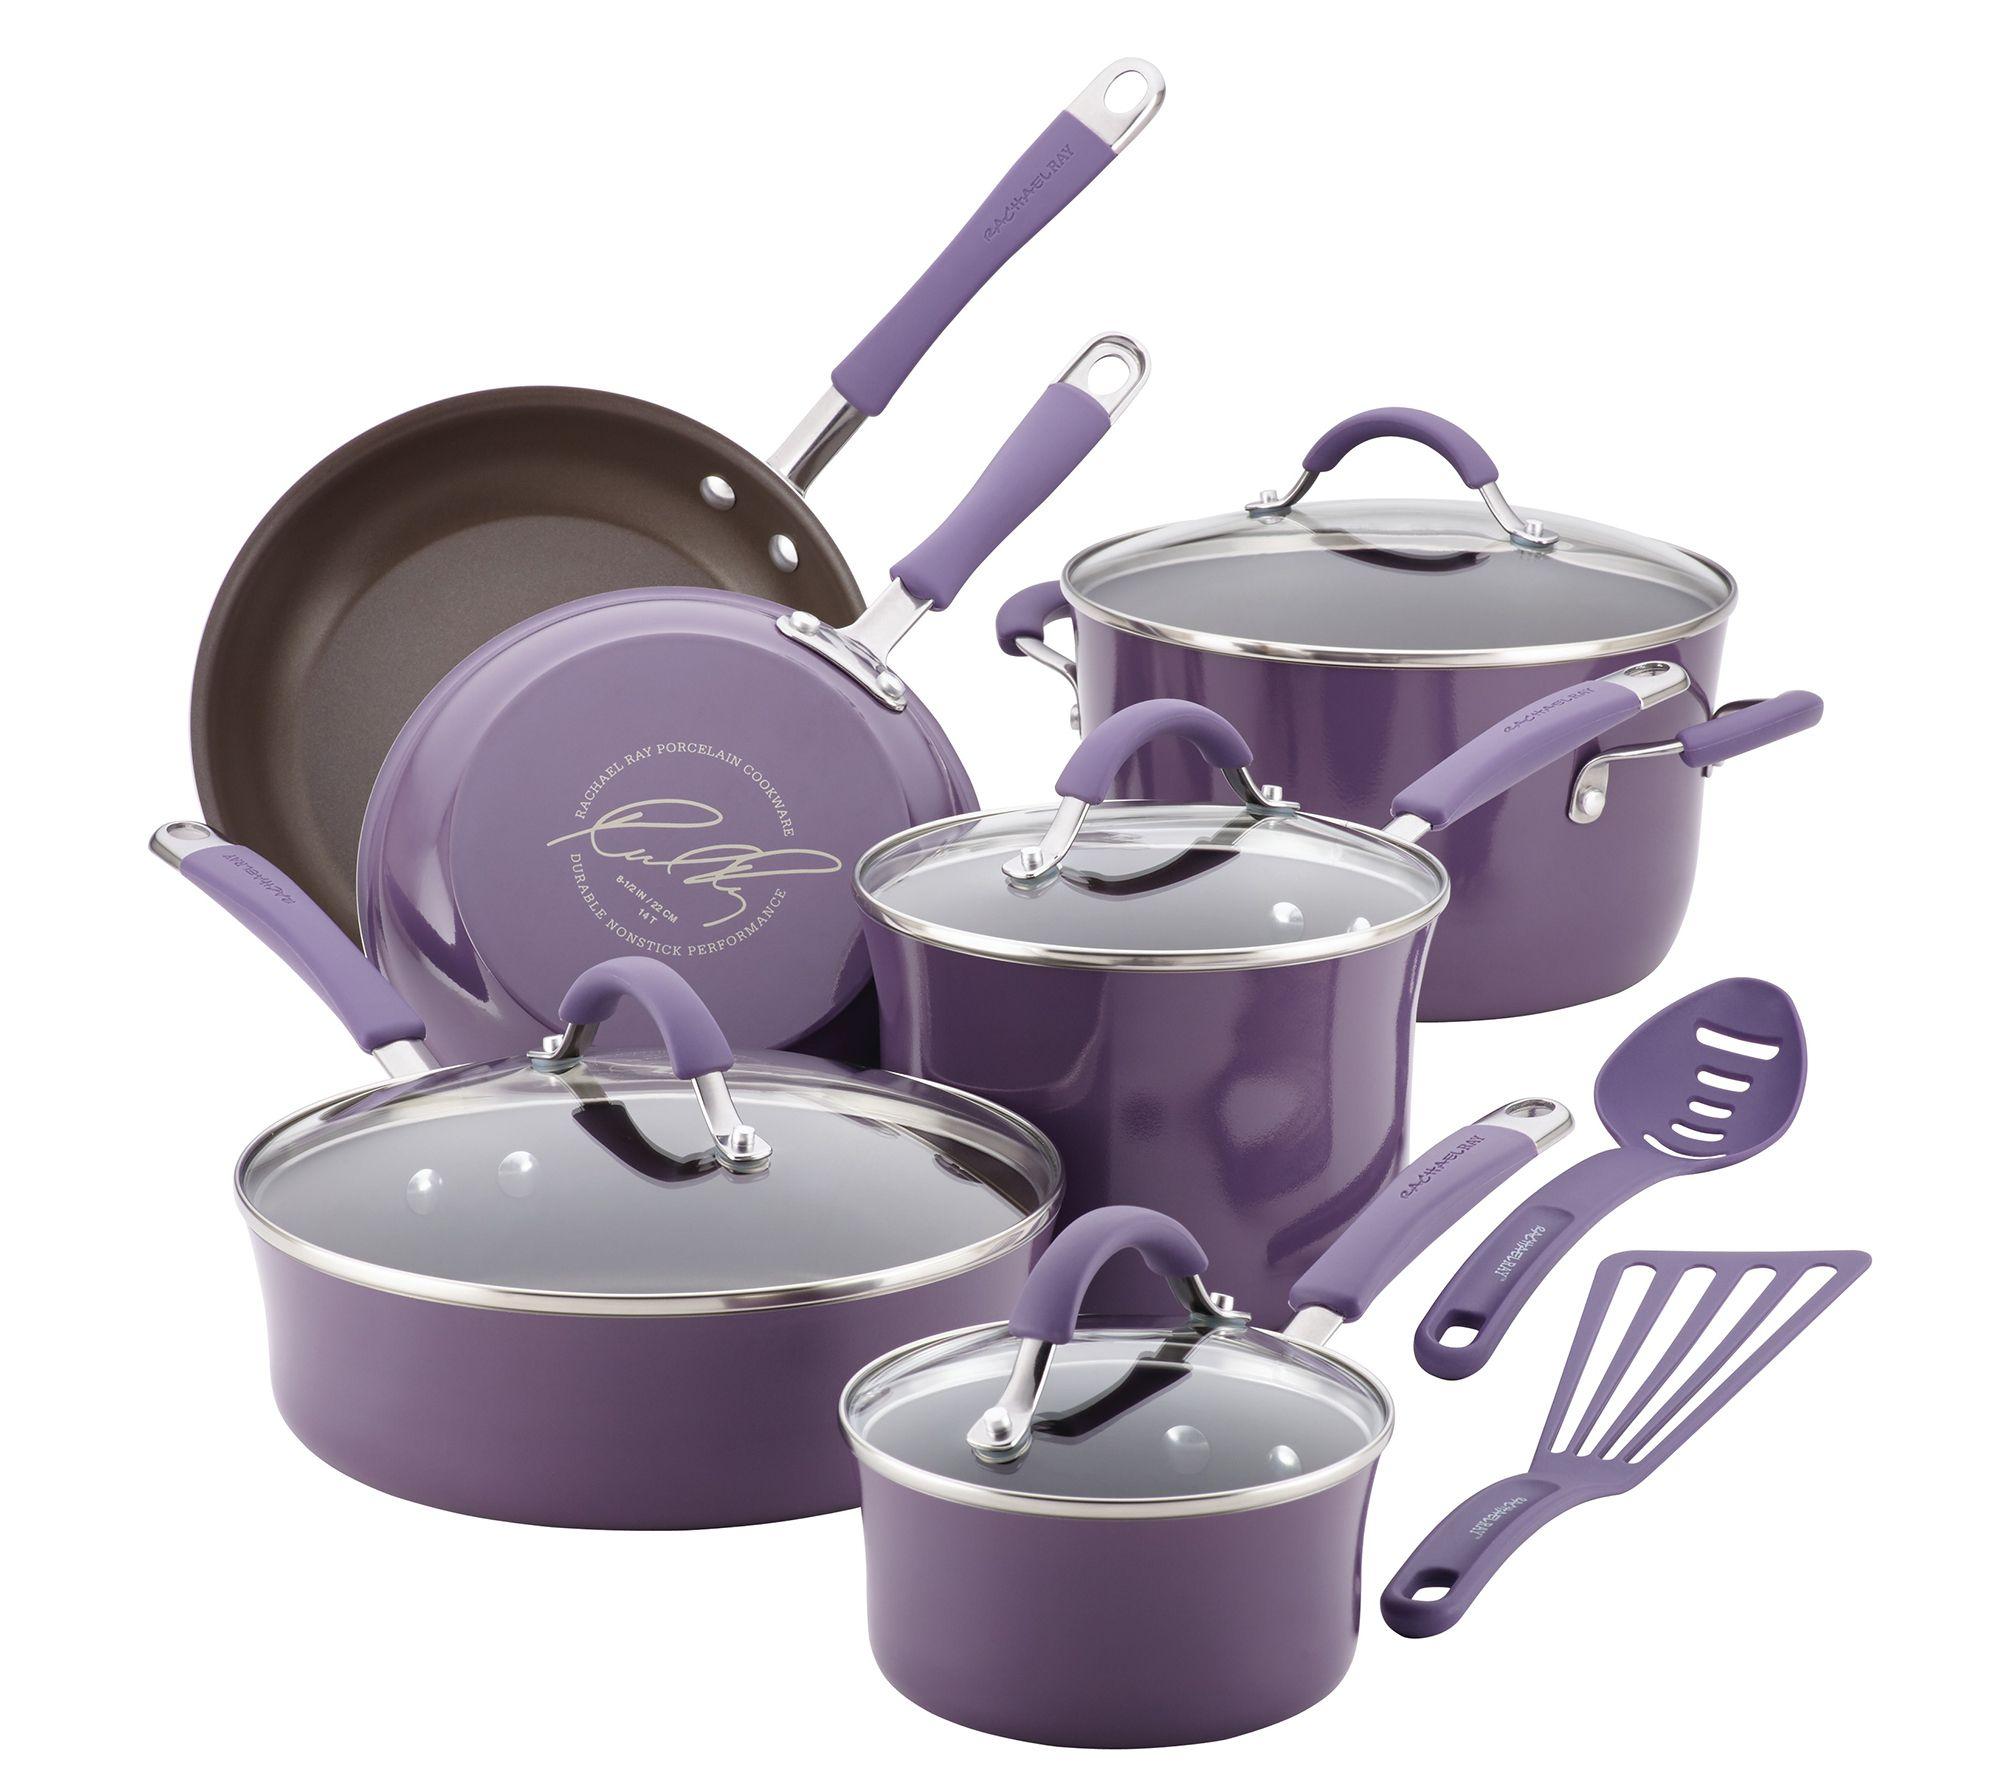 Rachael Ray Cucina Hard Enamel 12-Piece Cookware Set - Page 1 ...